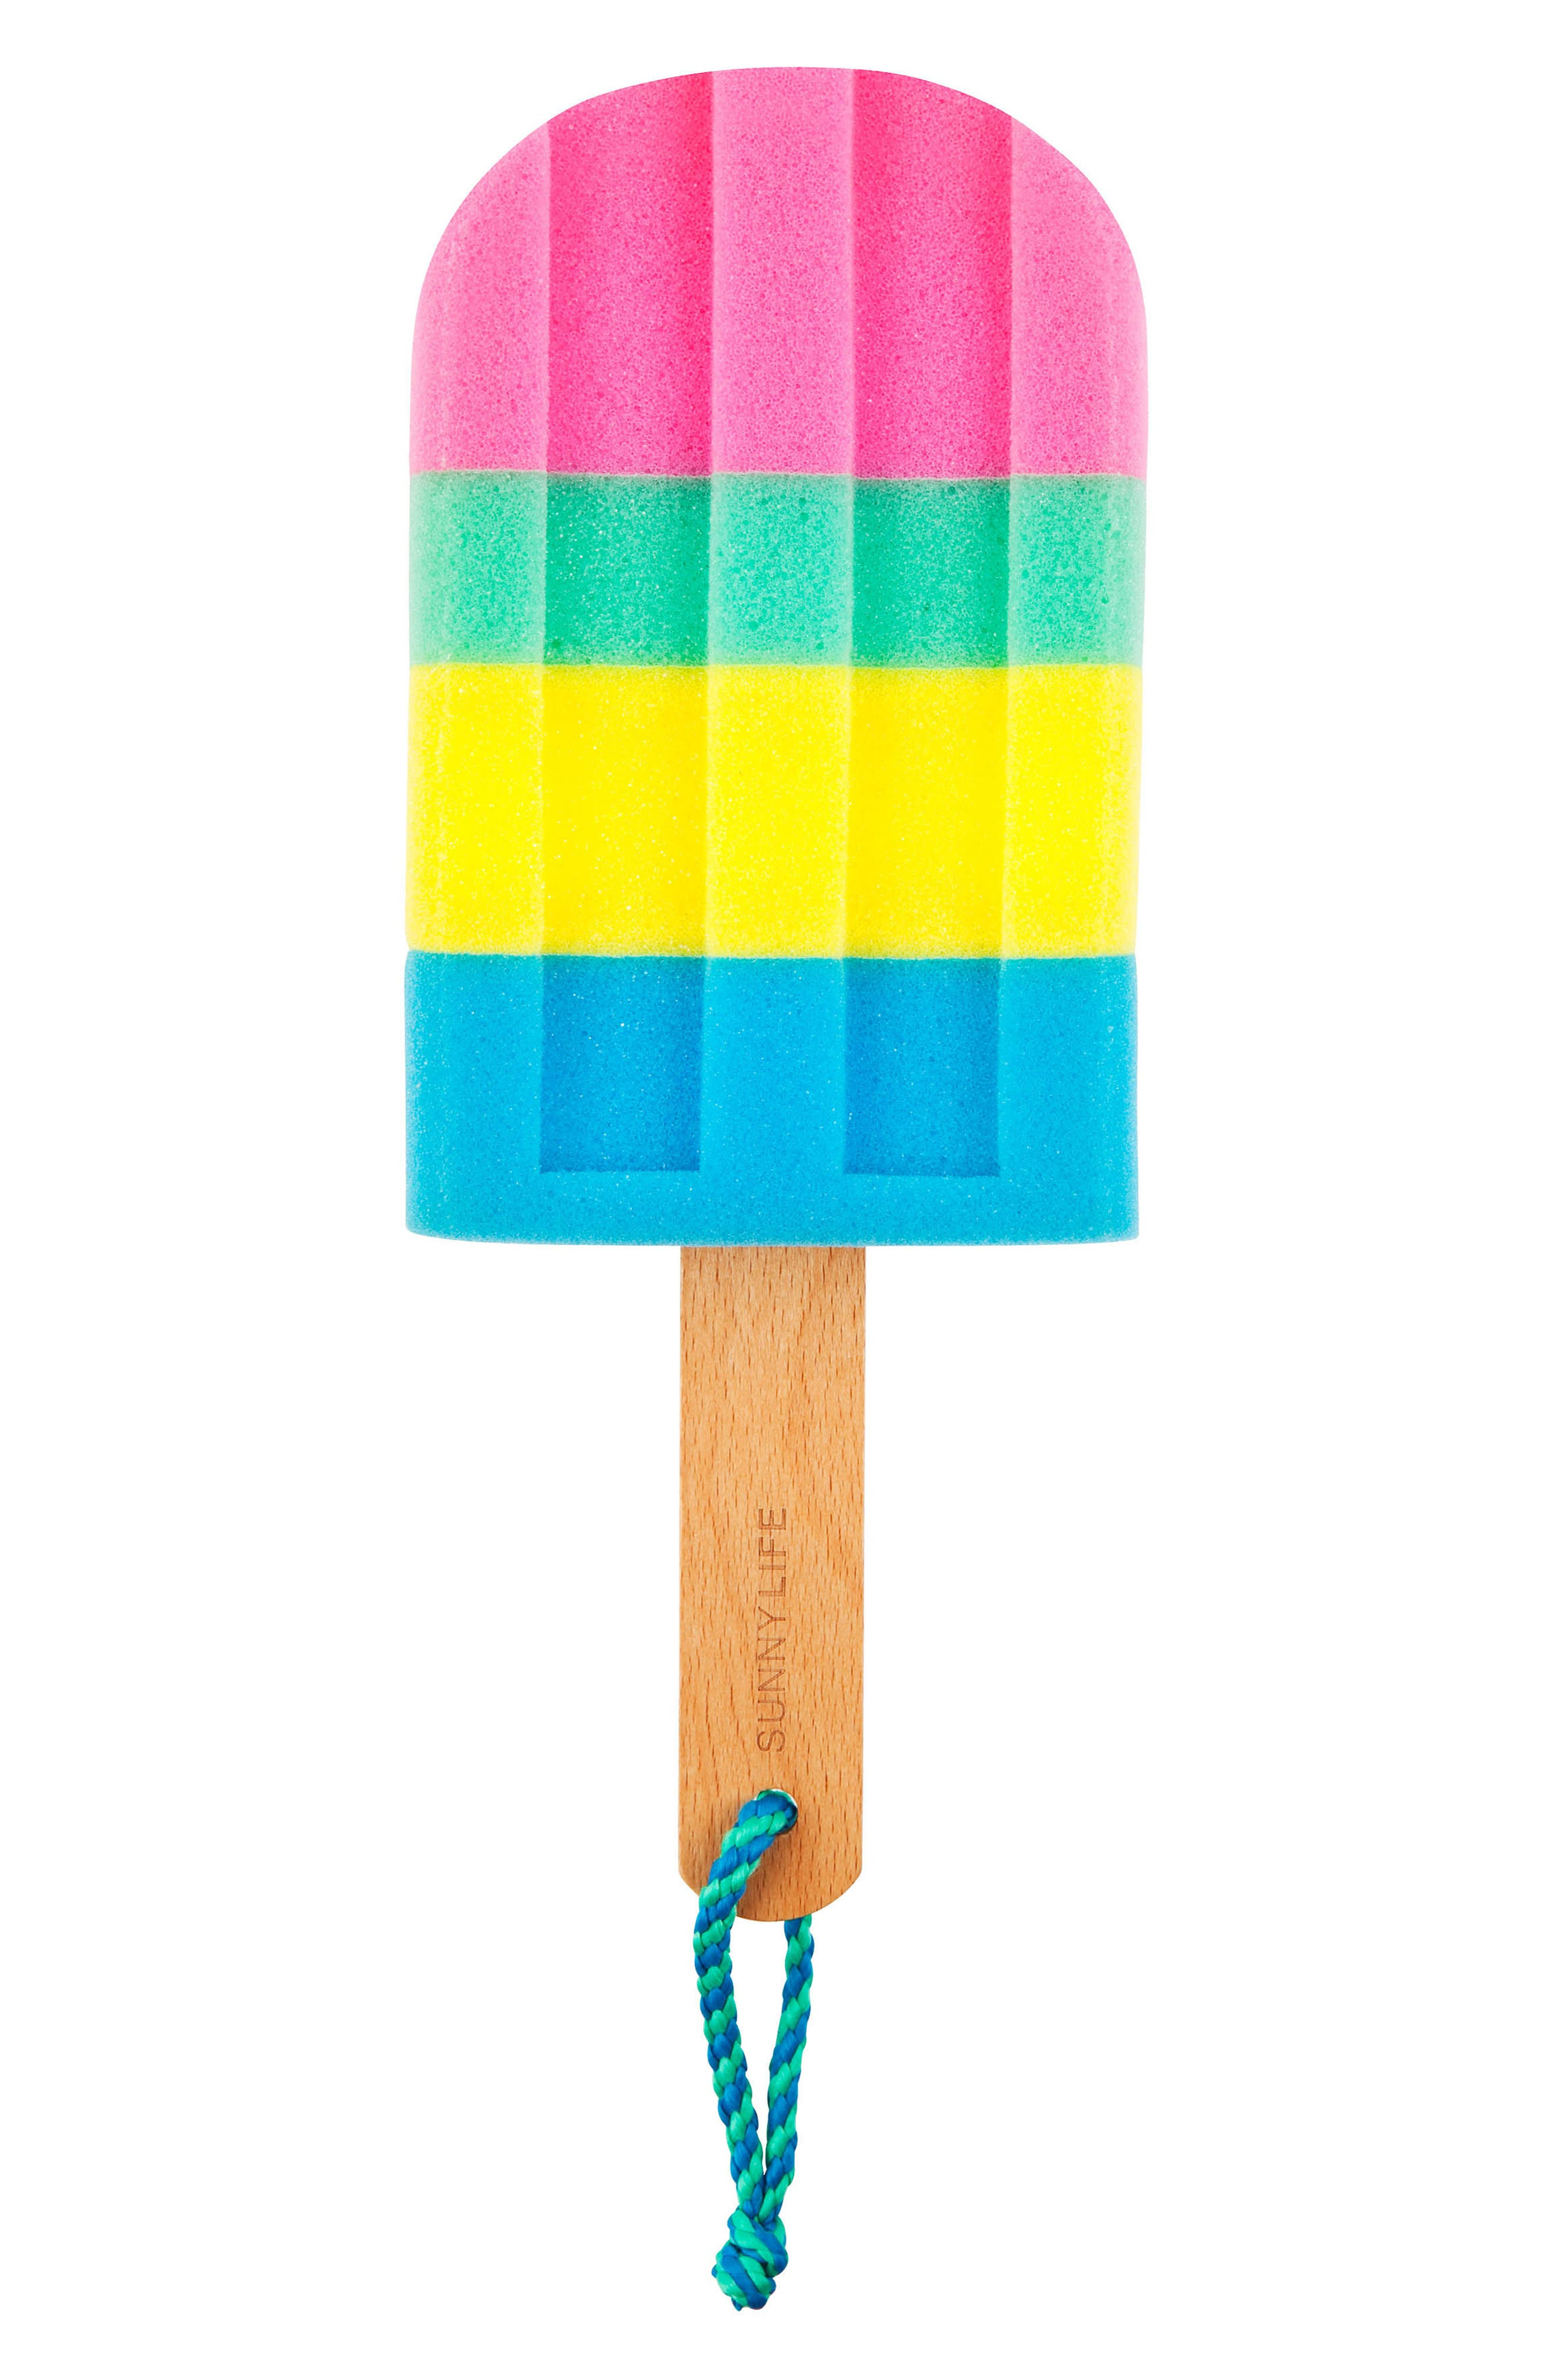 Ice Lolly Bath Sponge,                         Main,                         color,